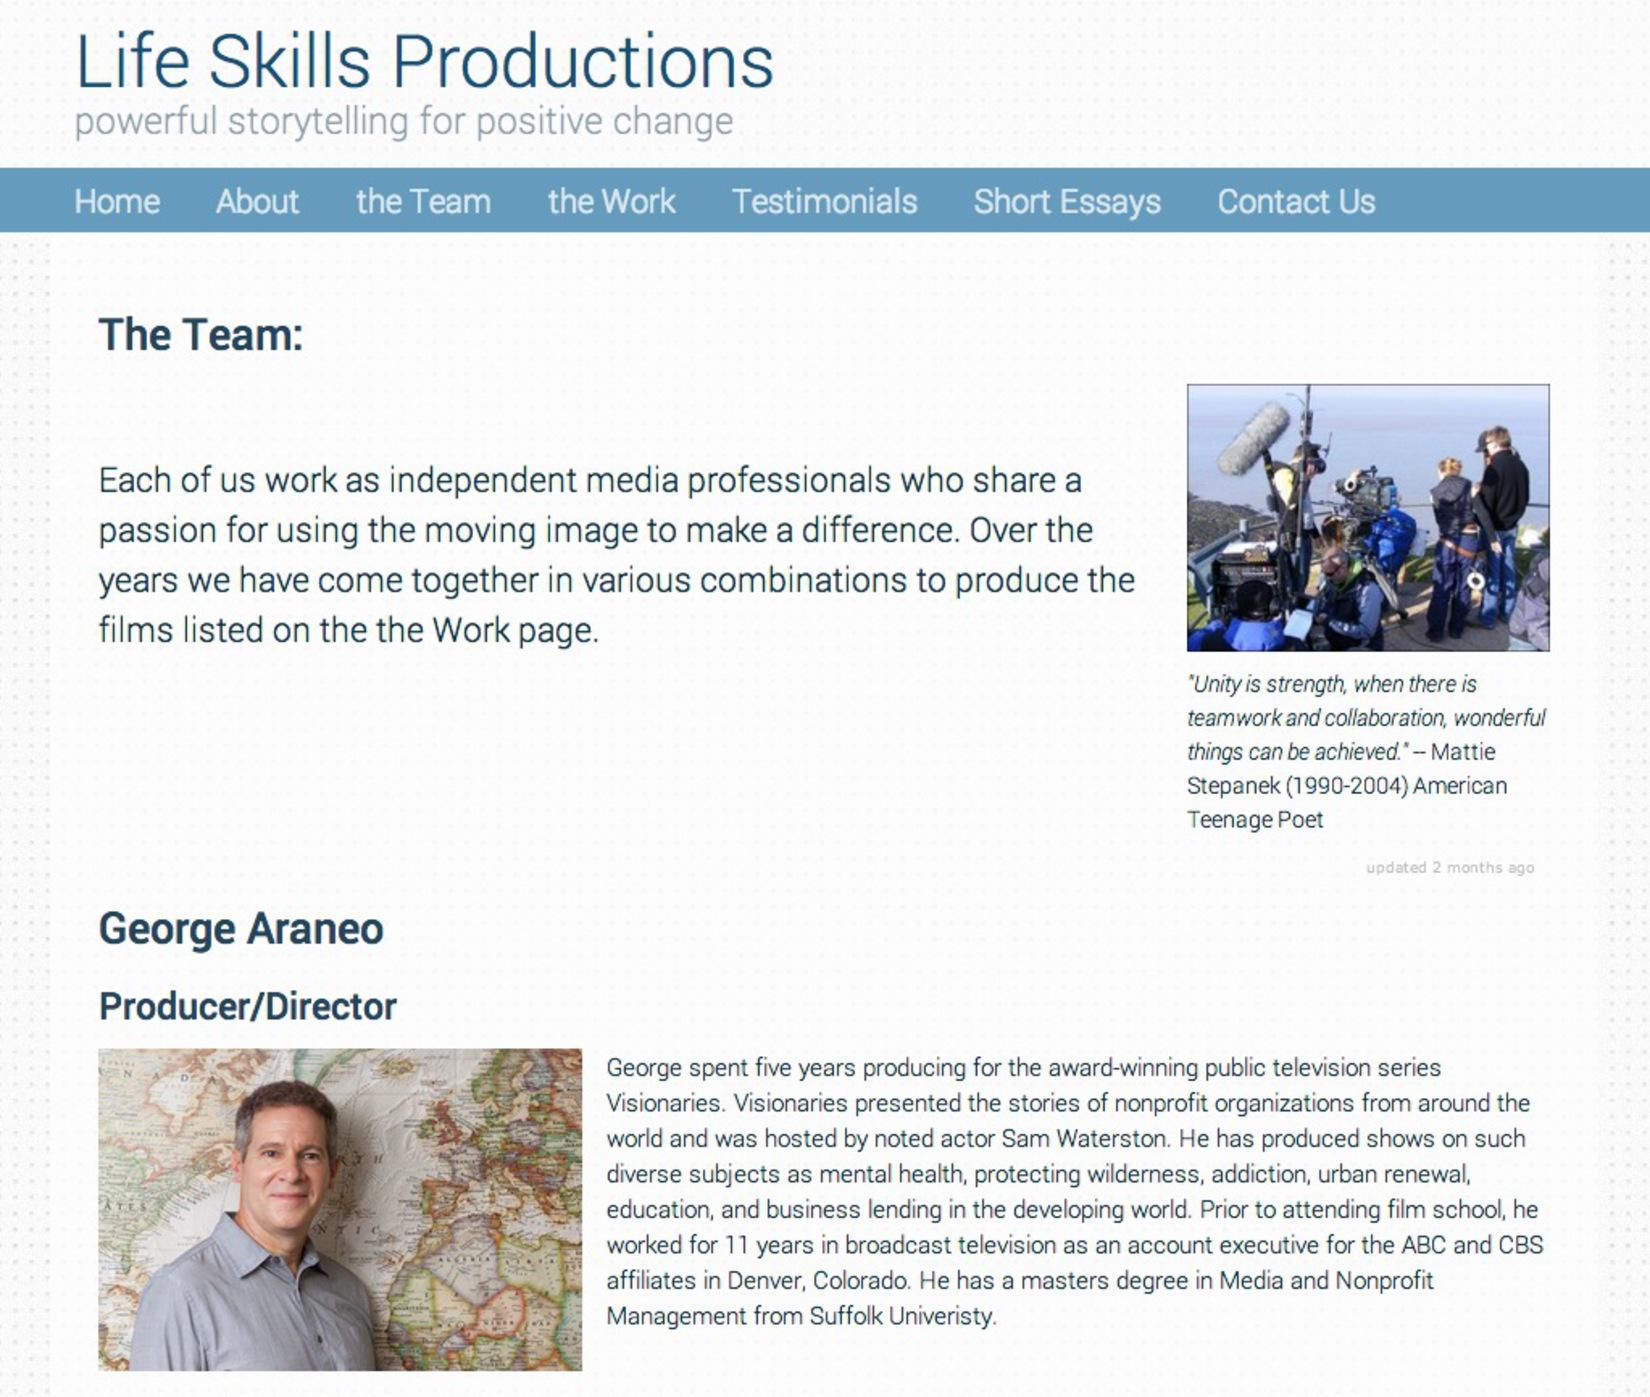 Life Skills Productions